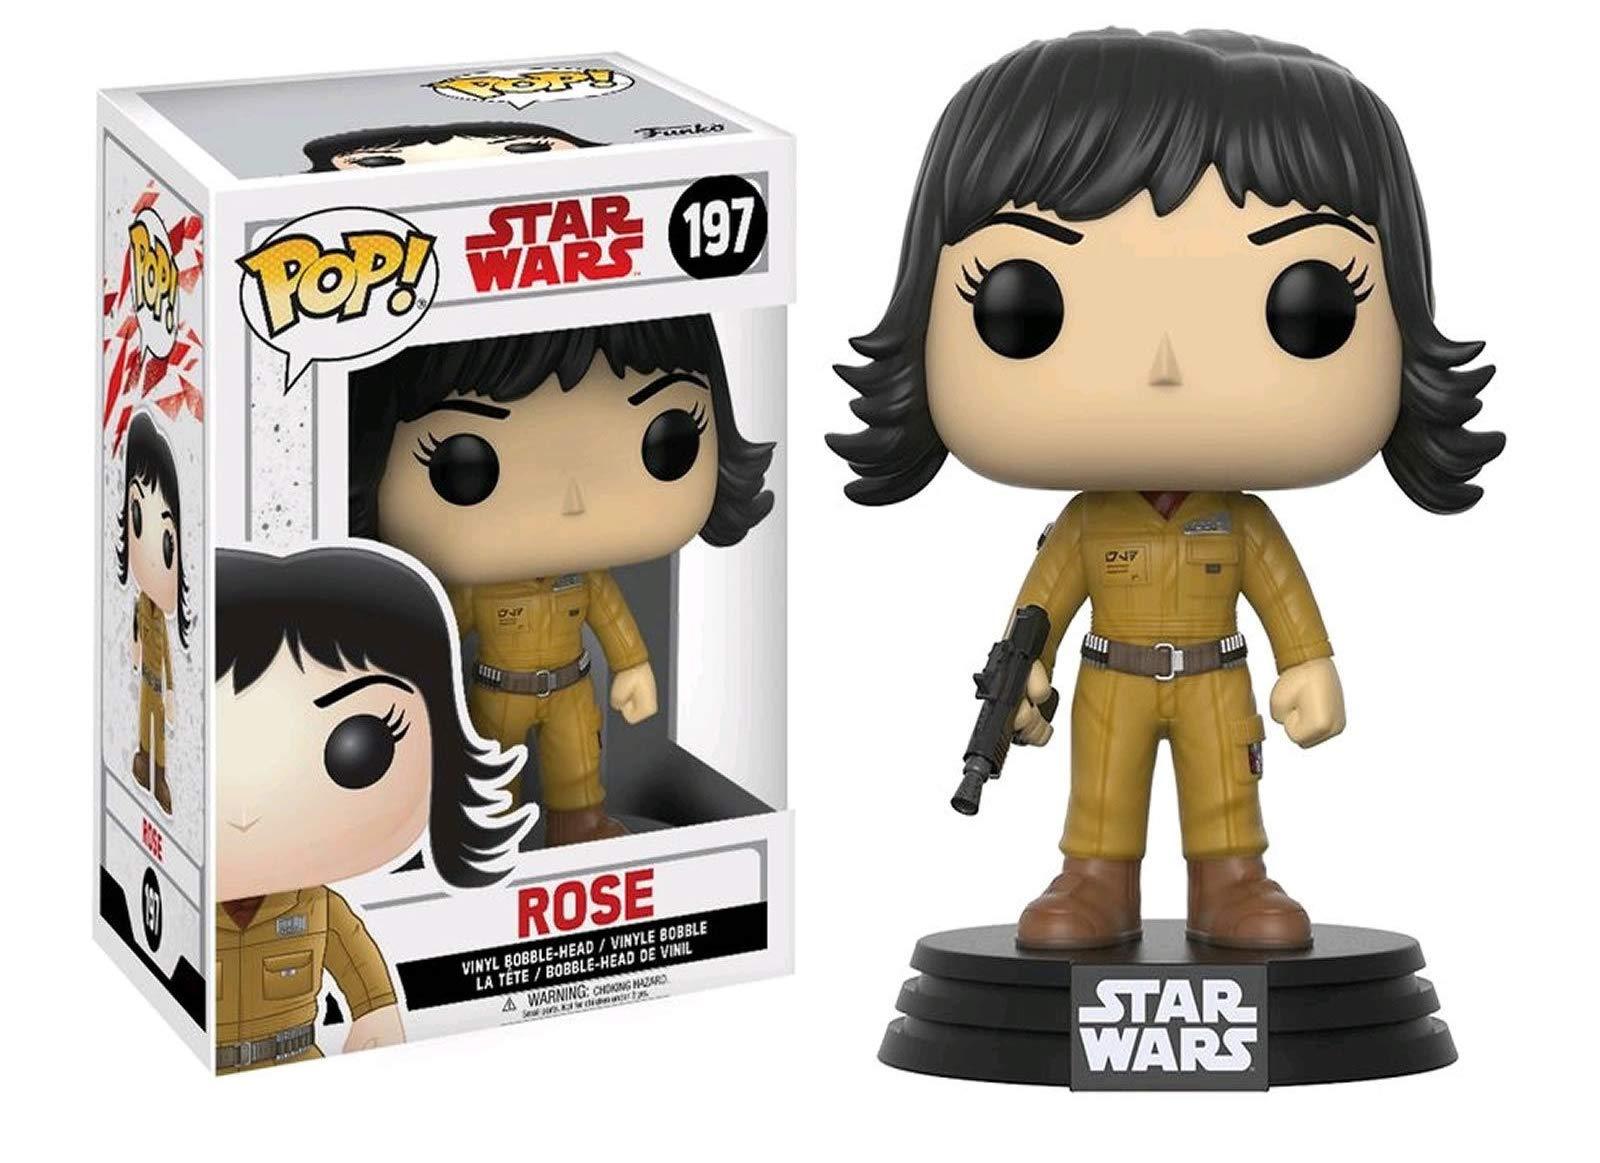 Funko Pop Rose (Star Wars 197) Funko Pop Star Wars